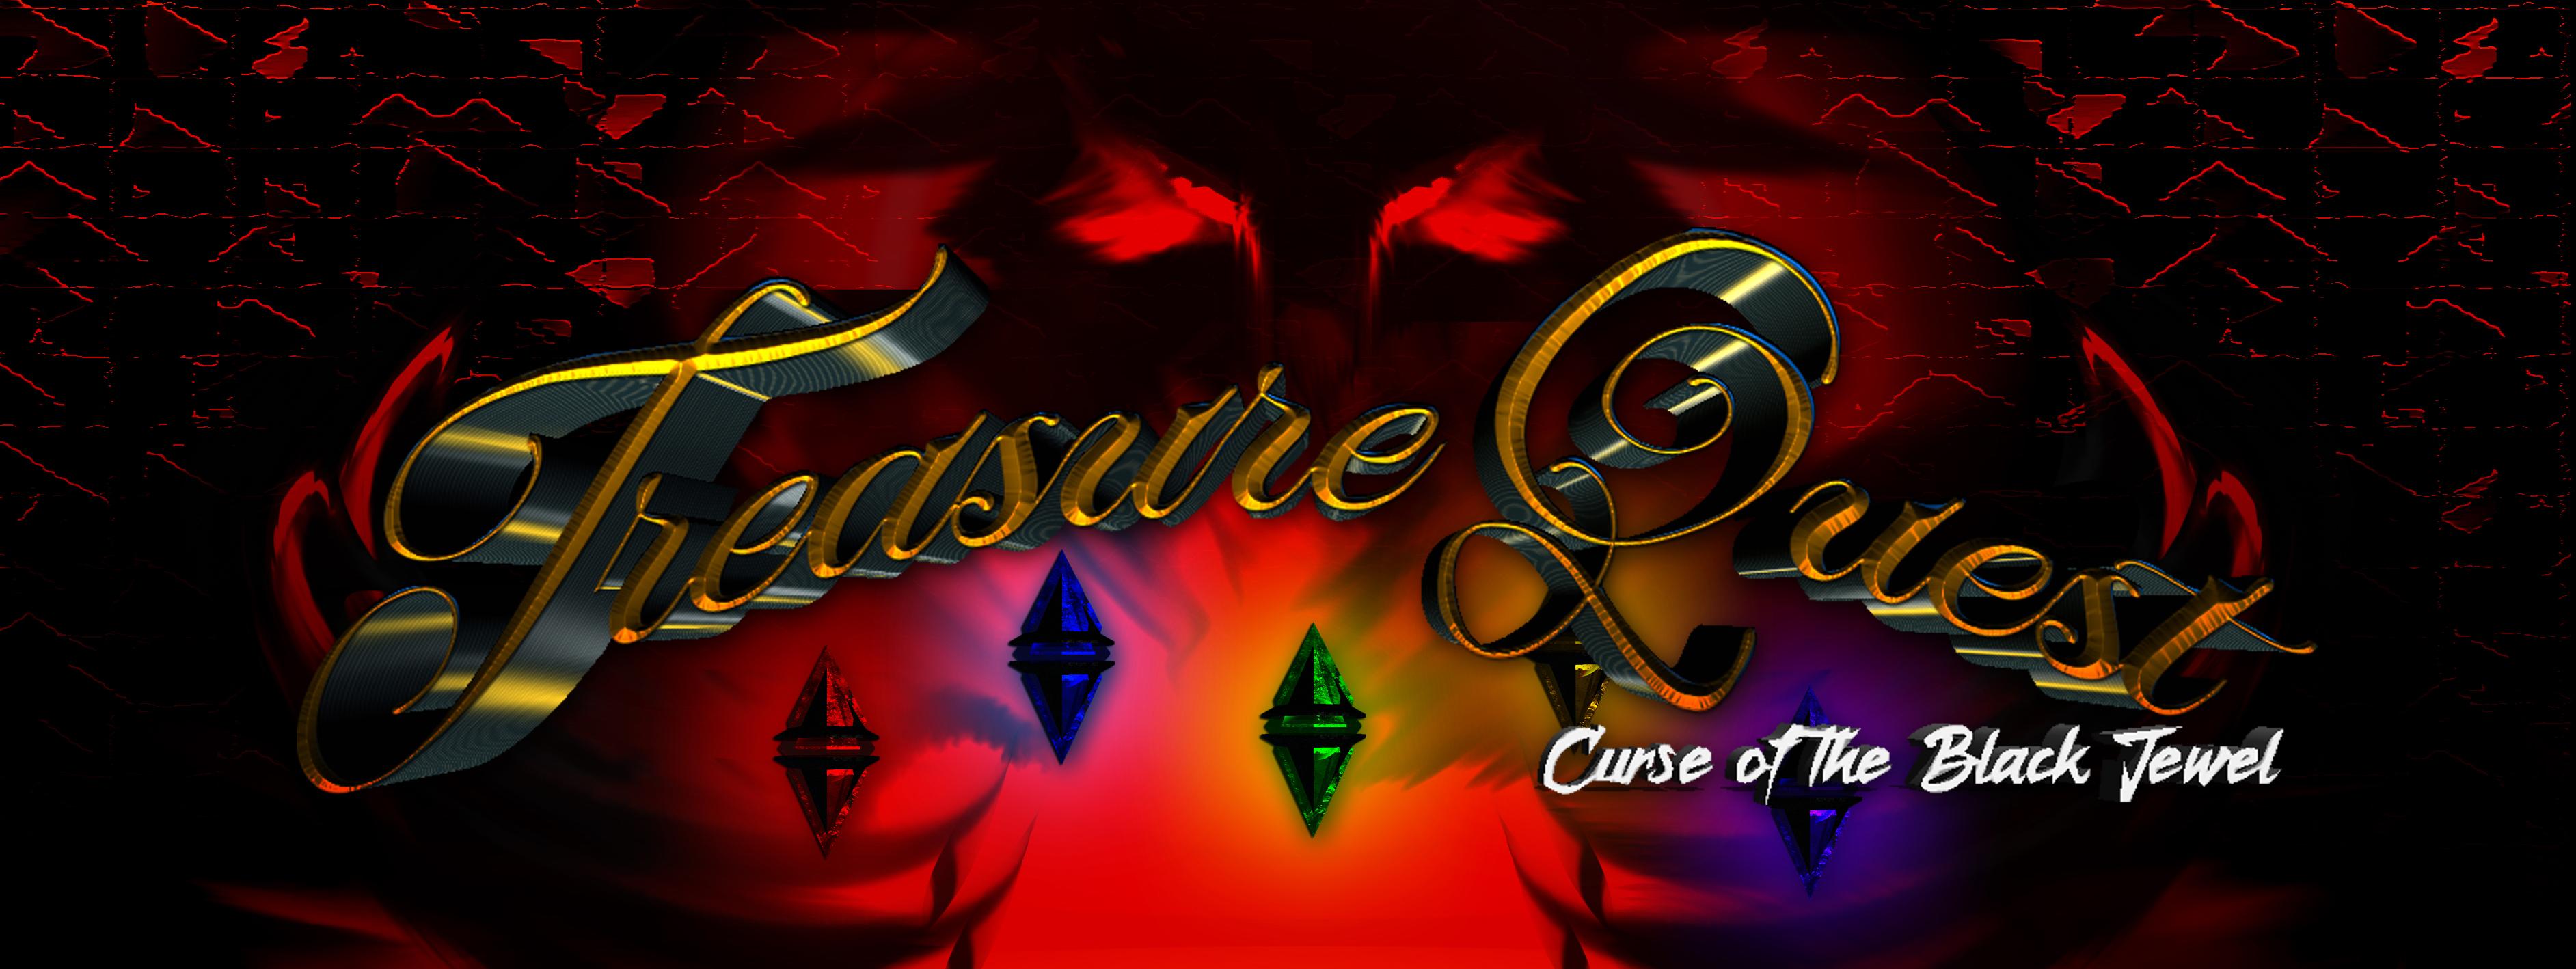 Treasure Quest: Curse of the Black Jewel